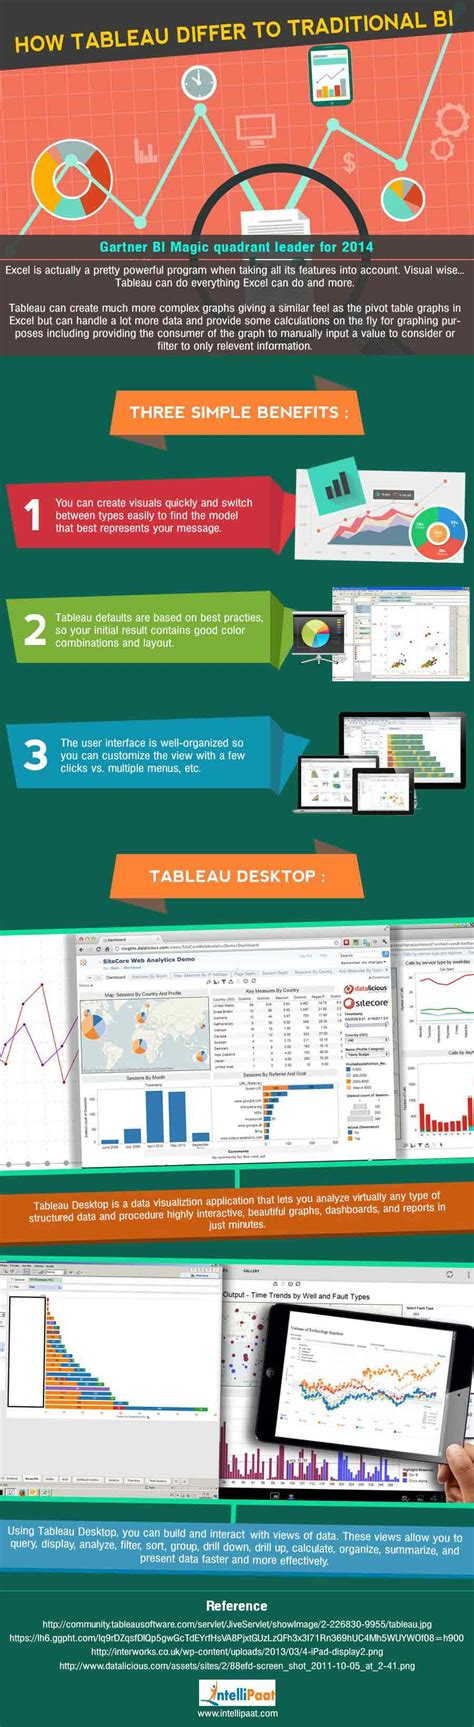 tableau desktop tutorial pdf tableau training online tableau certification course